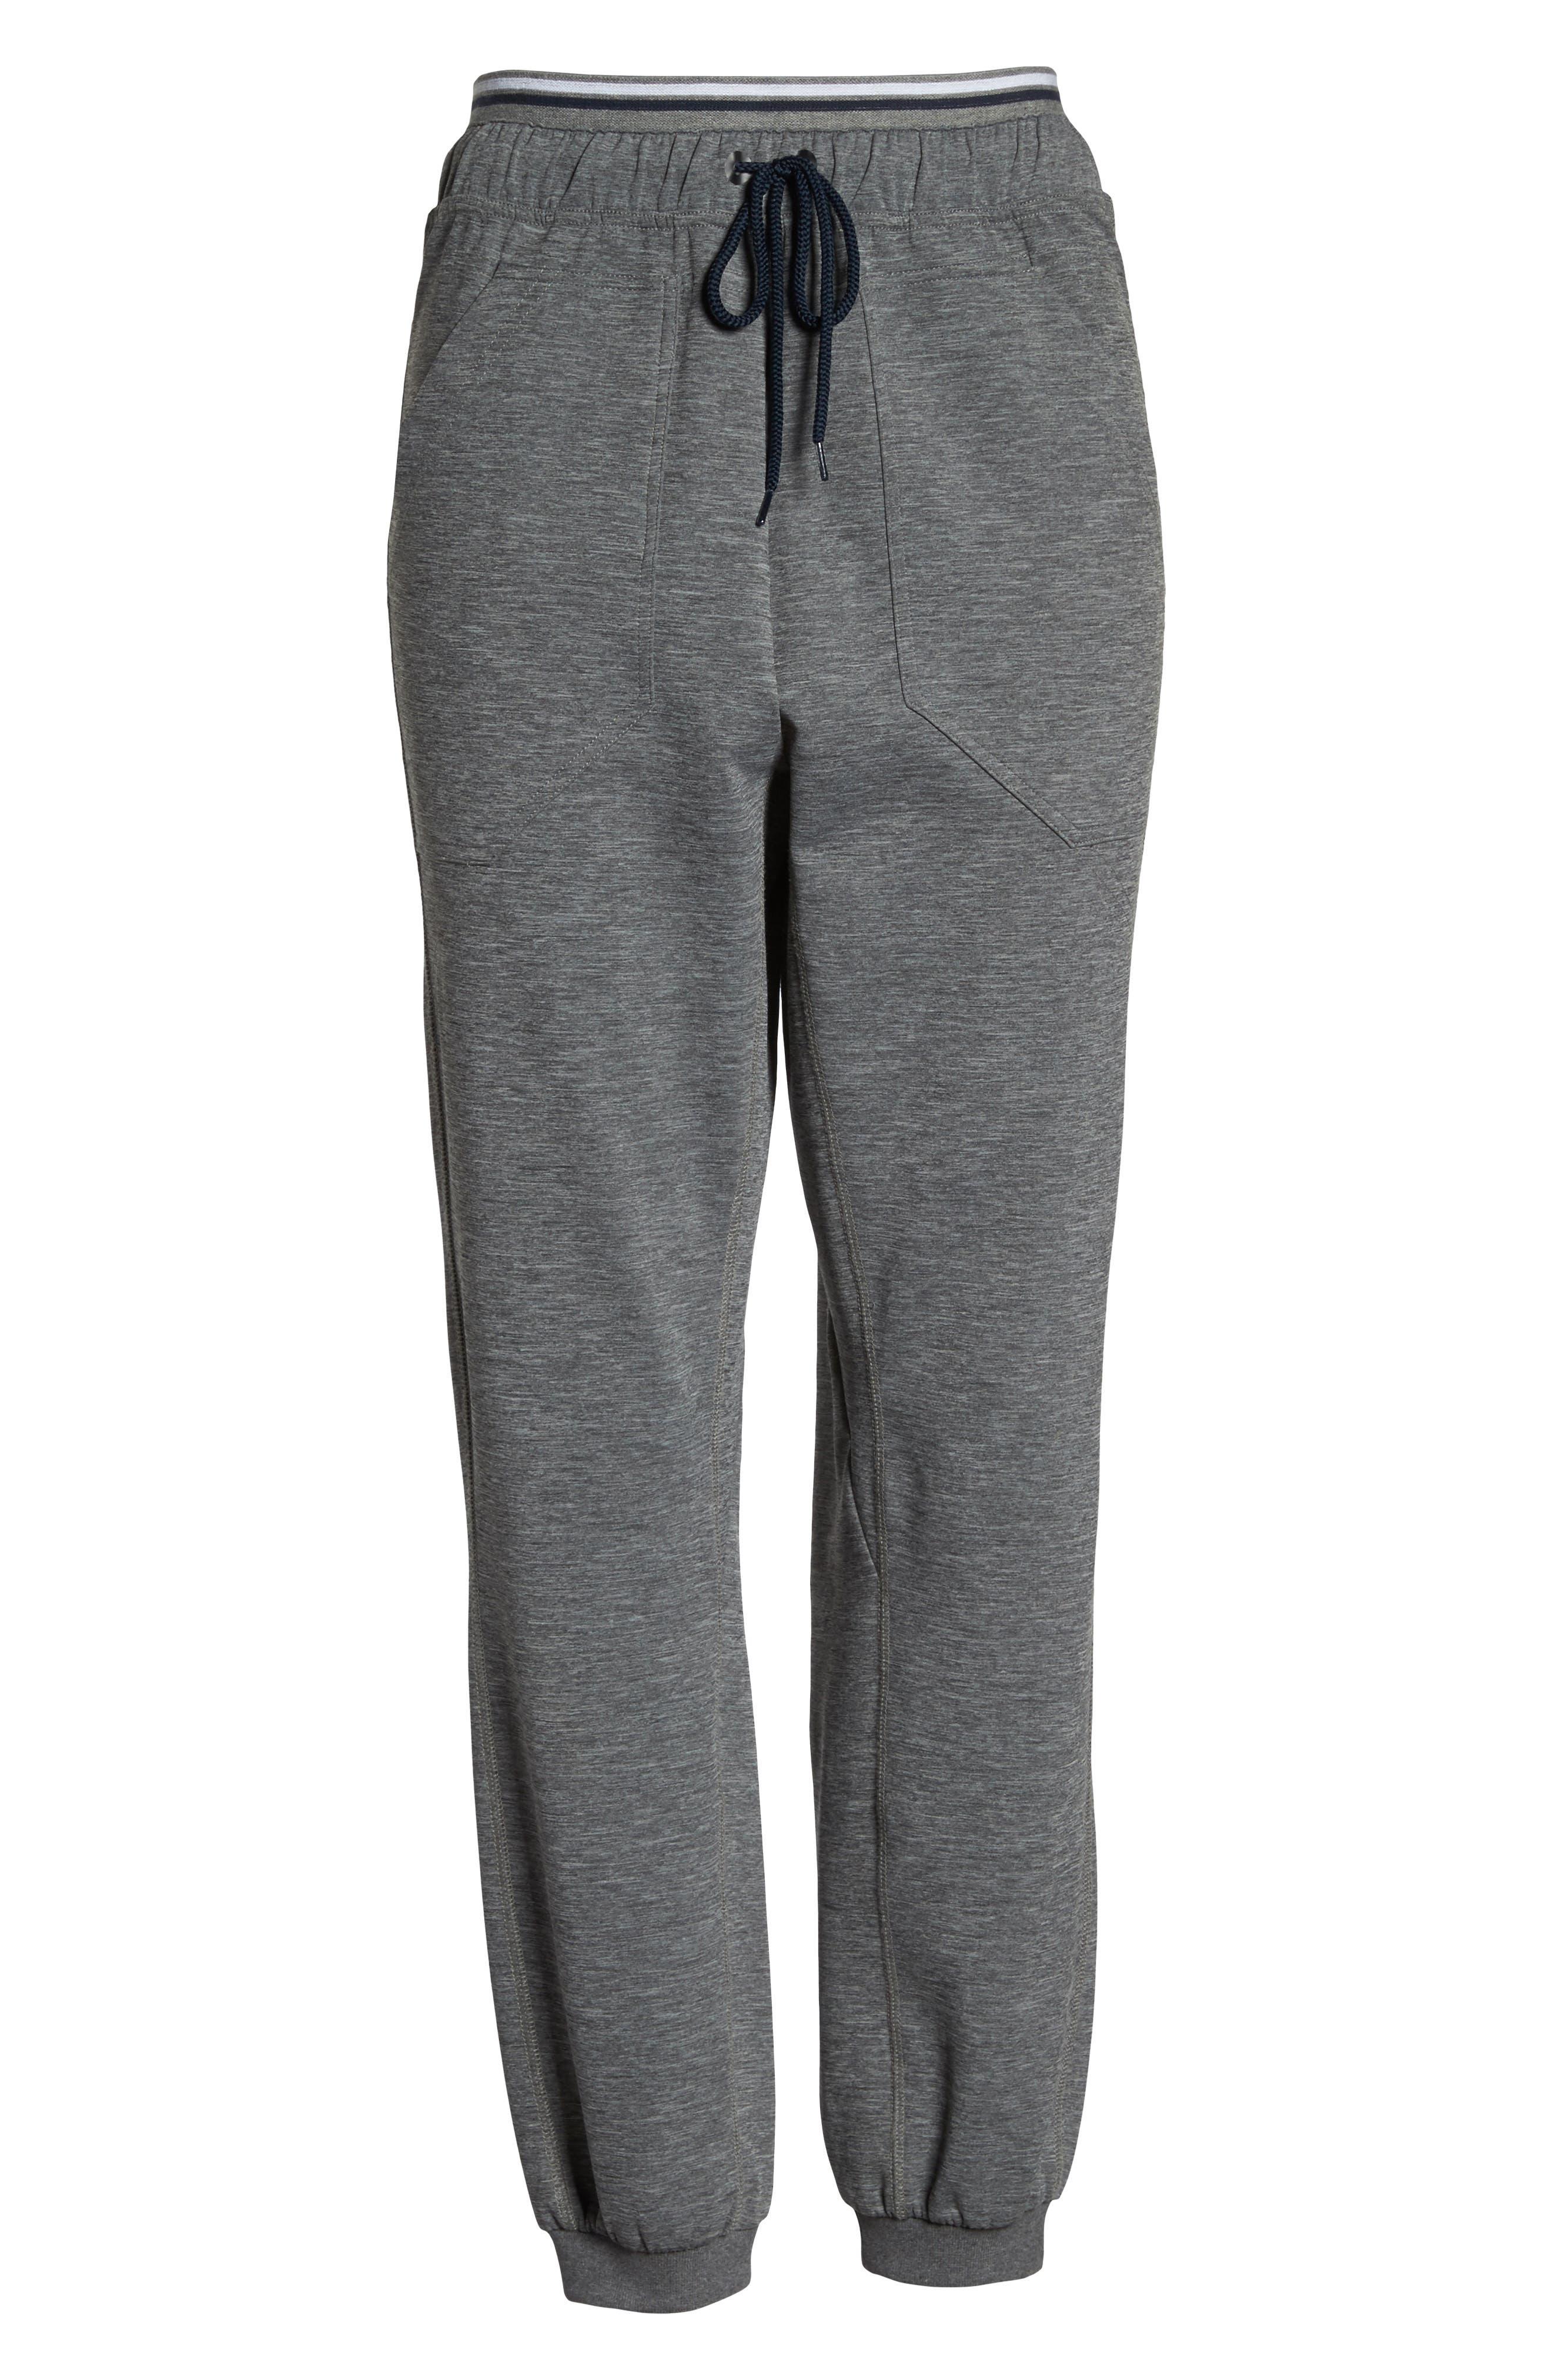 Circuit Track Pants,                             Alternate thumbnail 6, color,                             Grey Marl